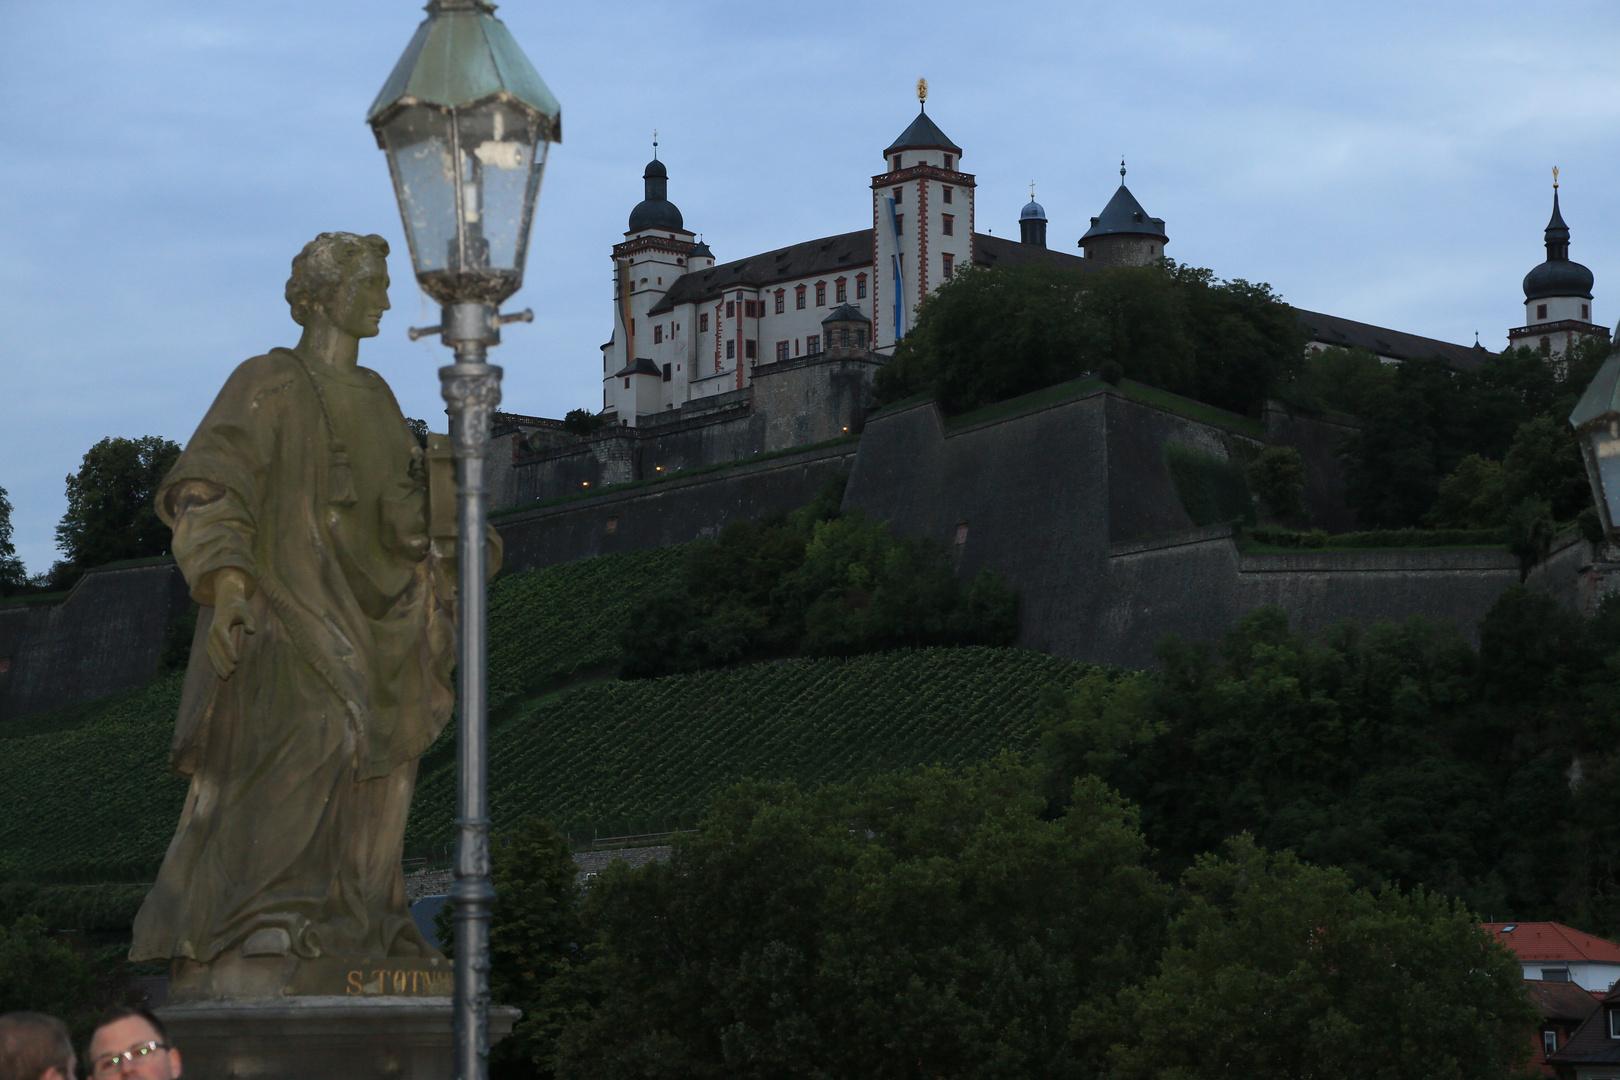 Schloss Marienberg in Würzburg